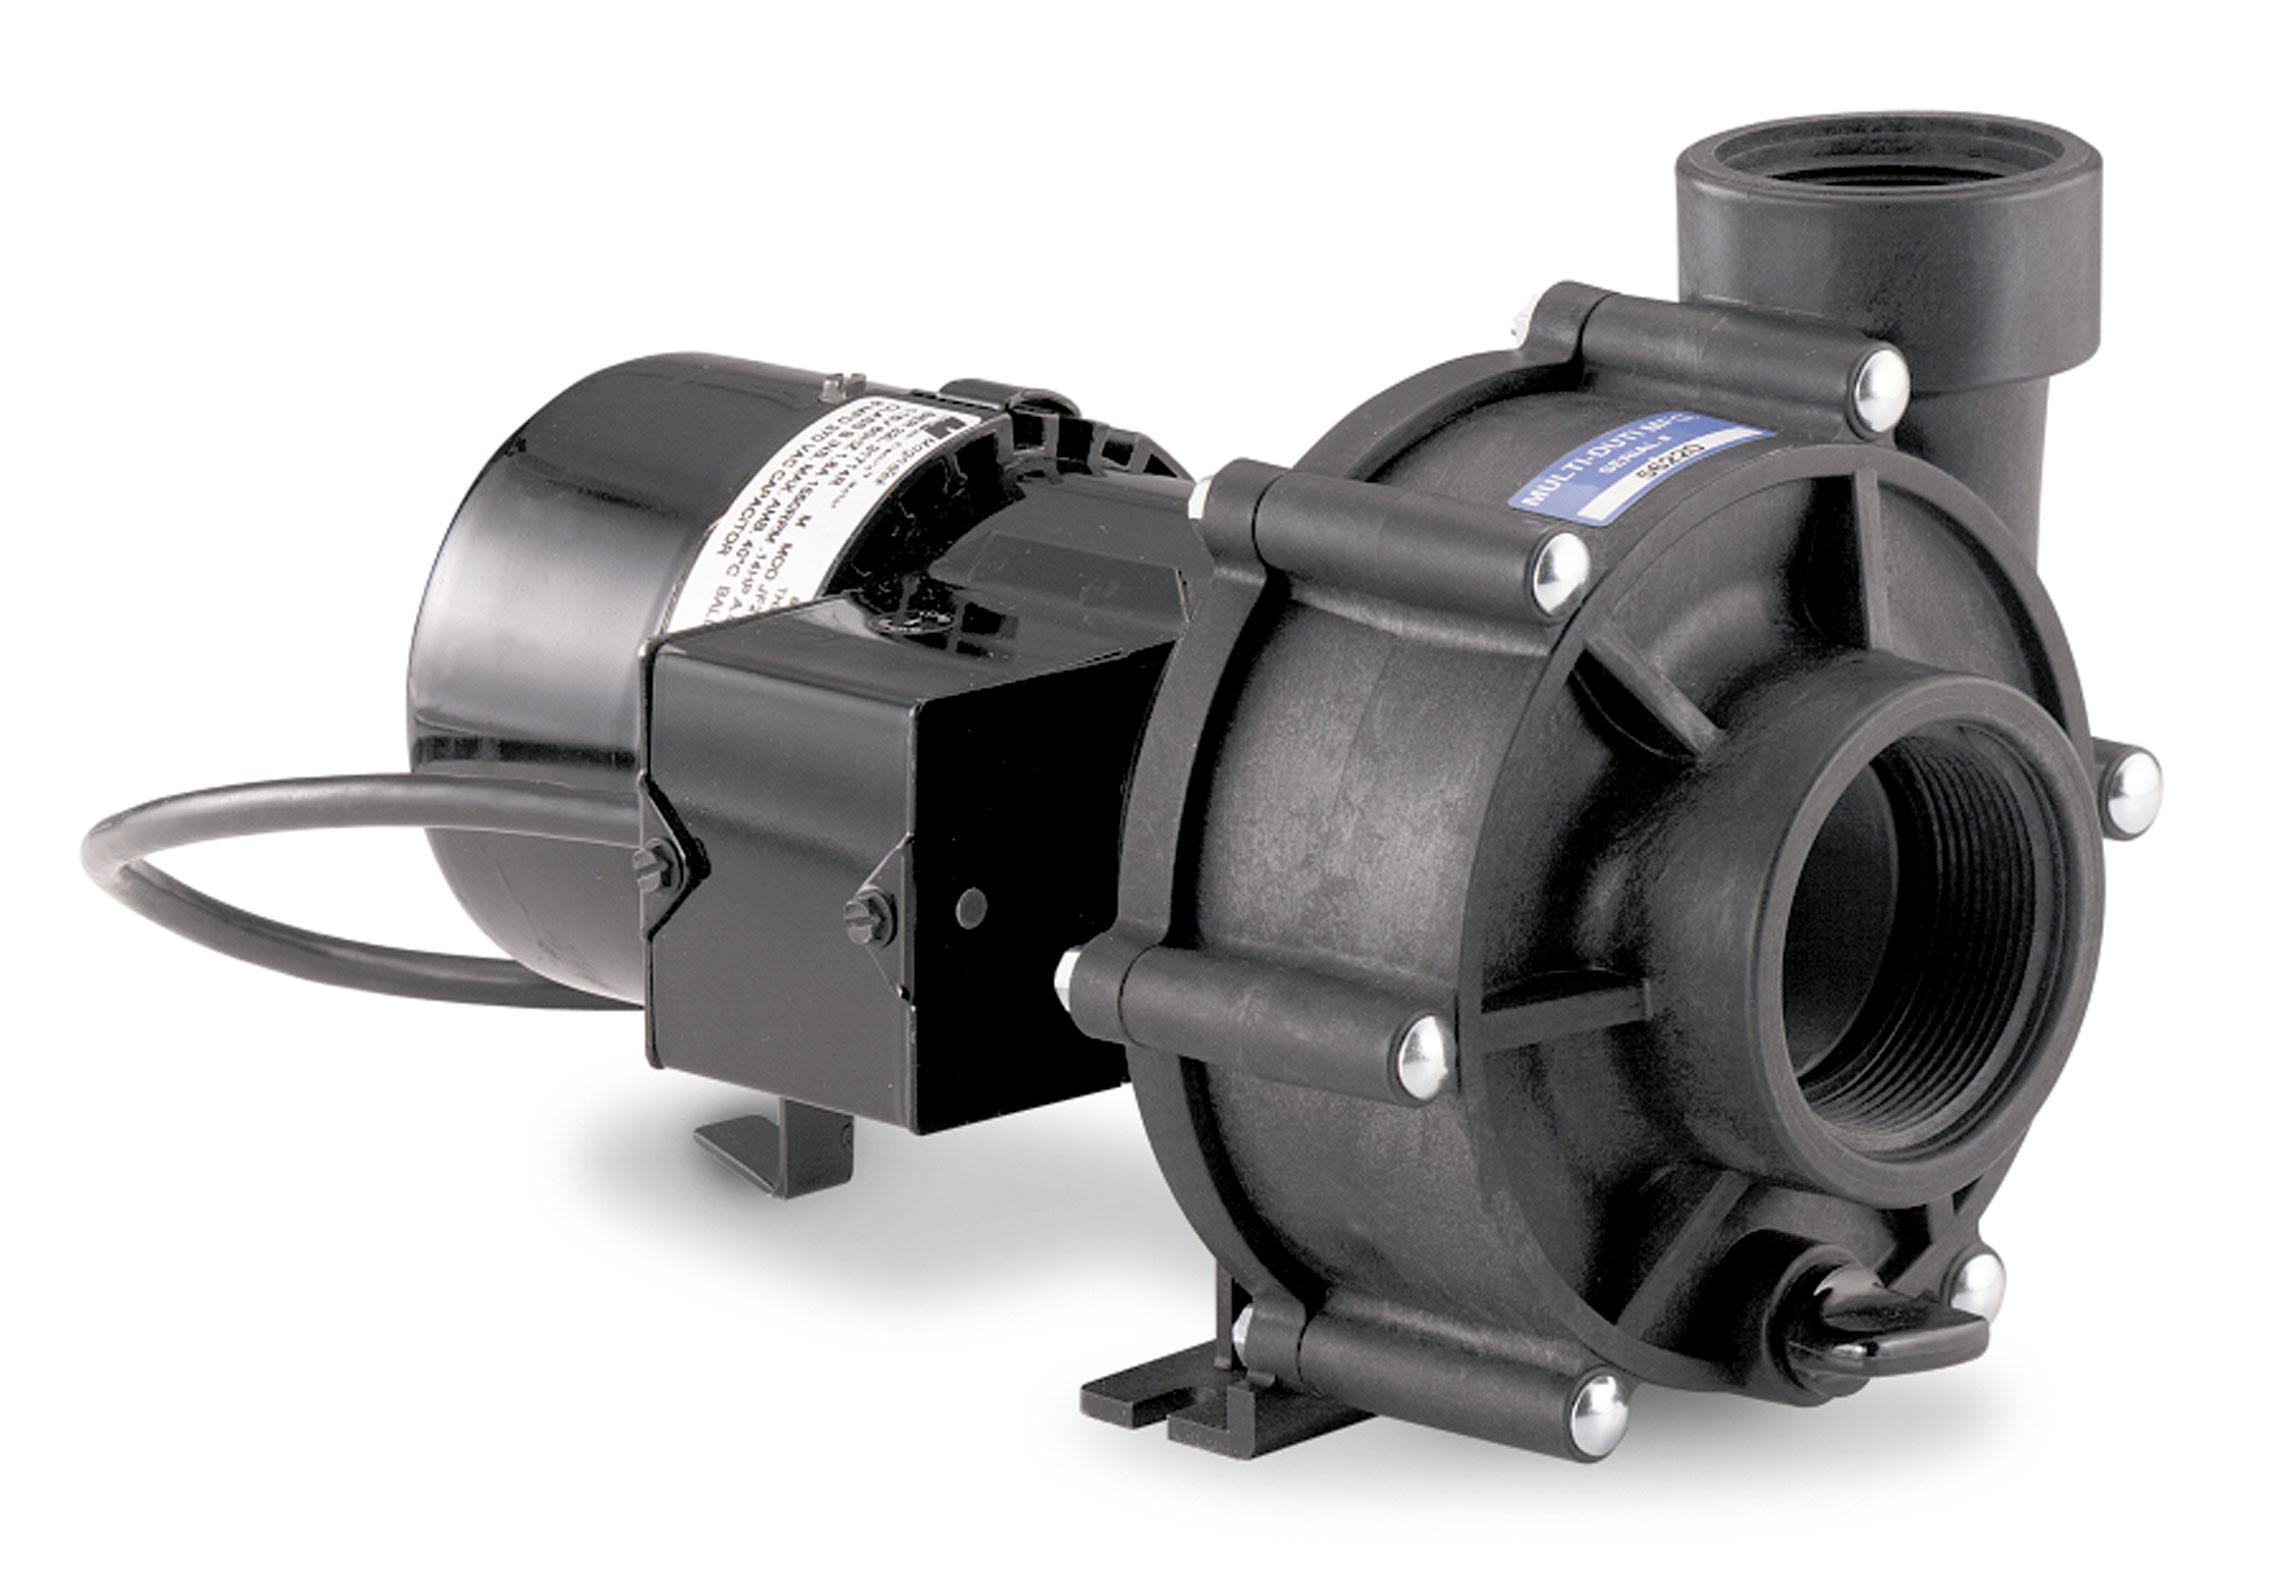 Small sump pump hydroponic aquarium with fish ipe cla for Install external pond pump